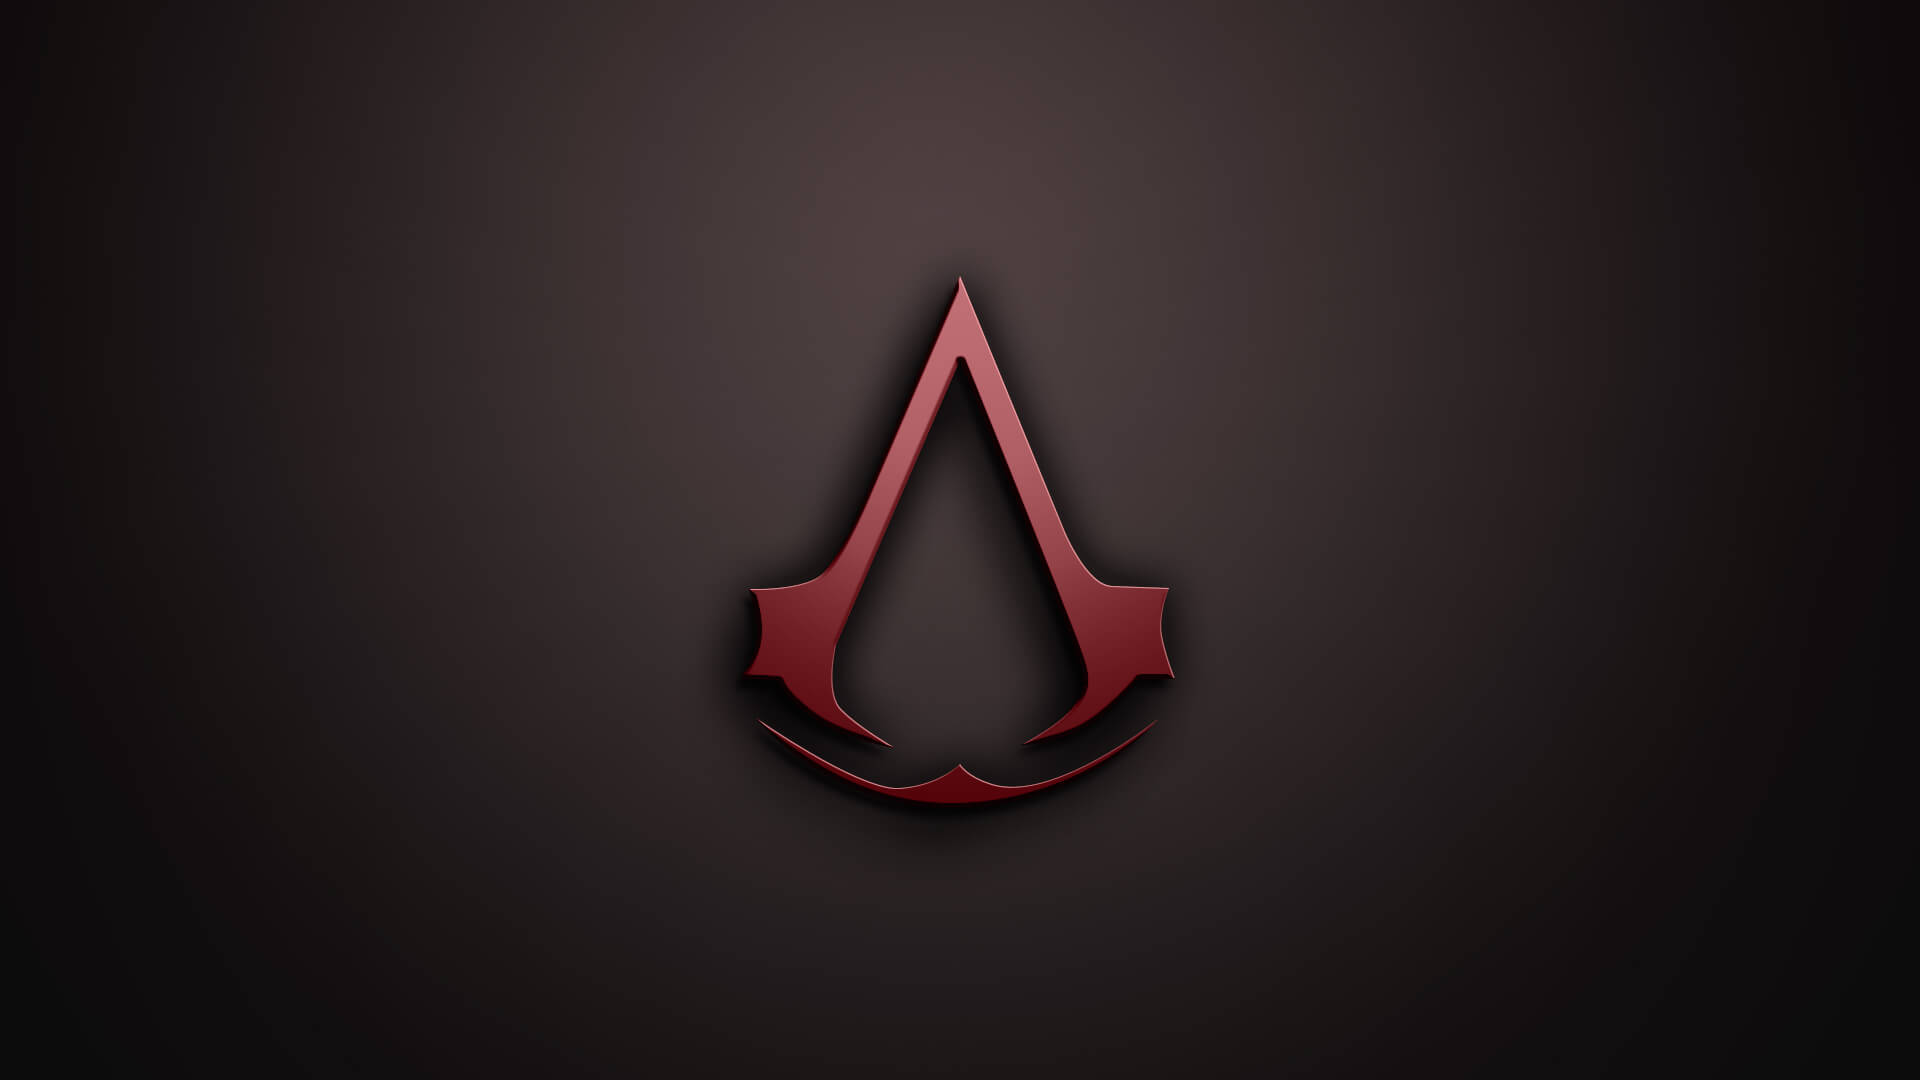 Assassin's Creed Ragnarok potencialmente vazou na Amazon